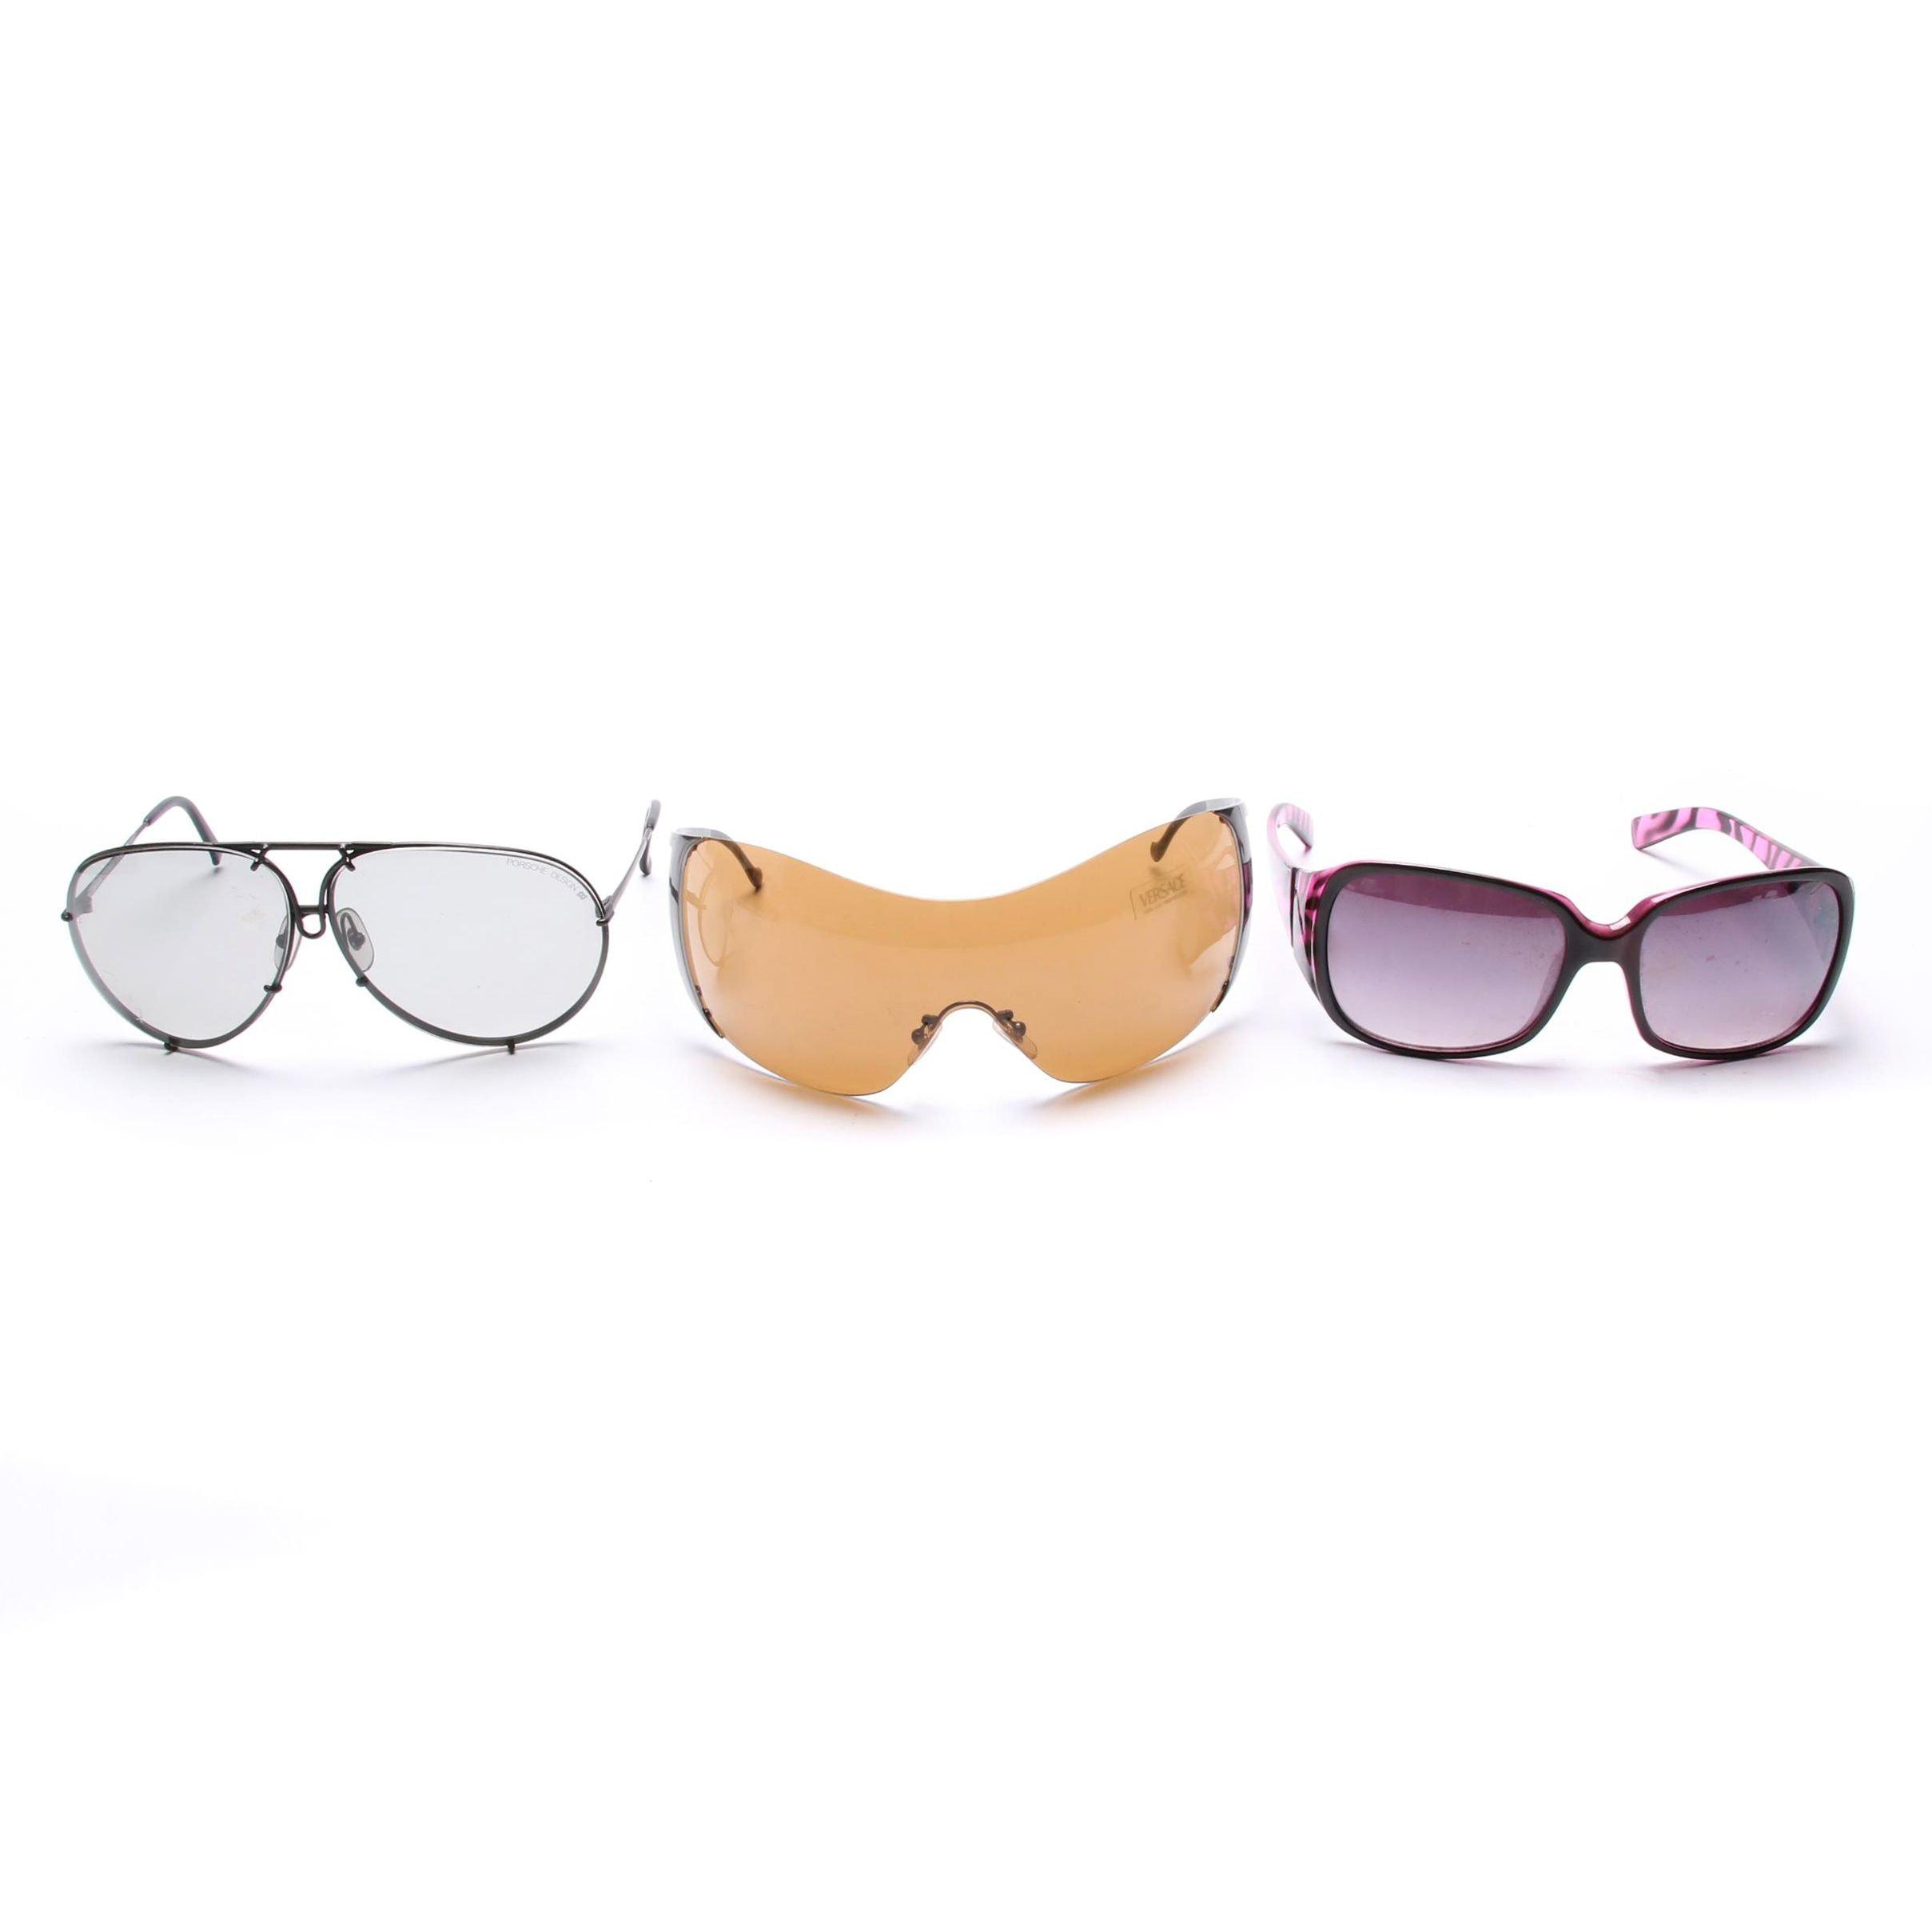 Versace, Carrera and Solaray Sunglasses